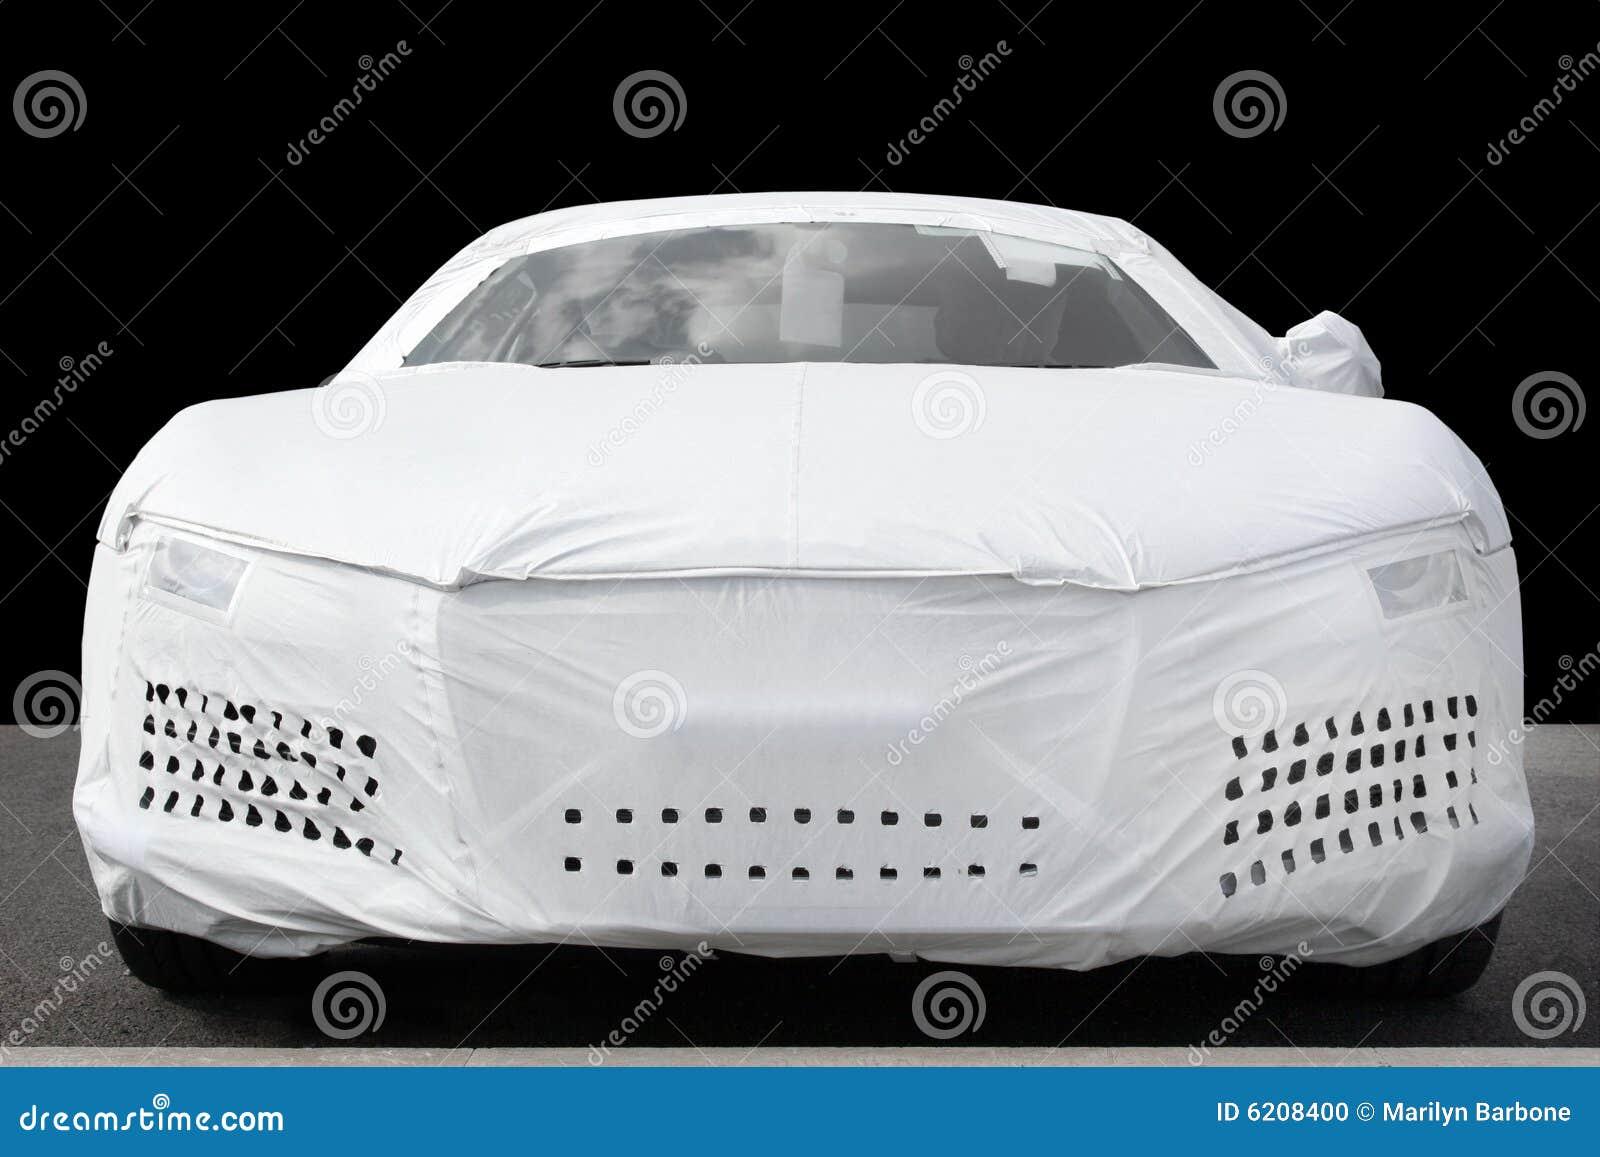 auto schutz abdeckung stockfoto bild 6208400. Black Bedroom Furniture Sets. Home Design Ideas